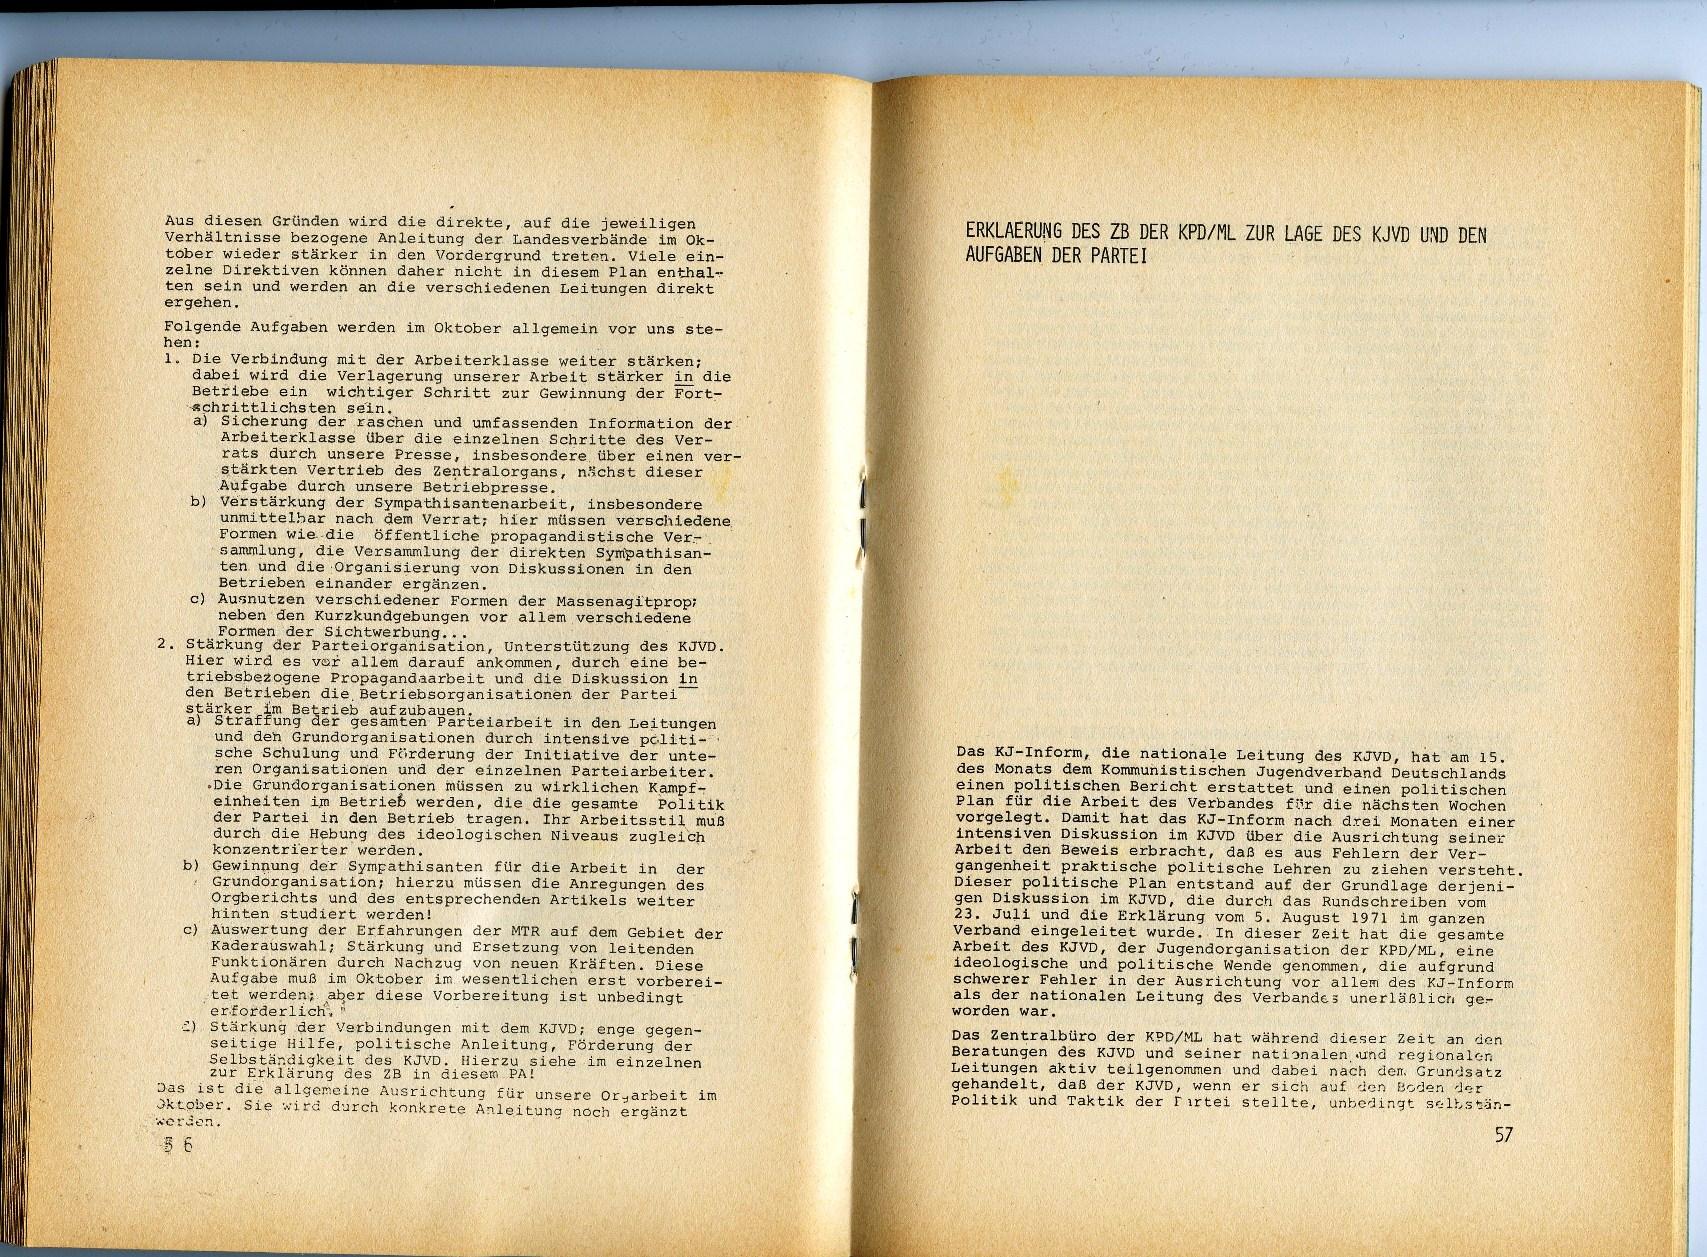 ZB_Parteiarbeiter_1971_08_30